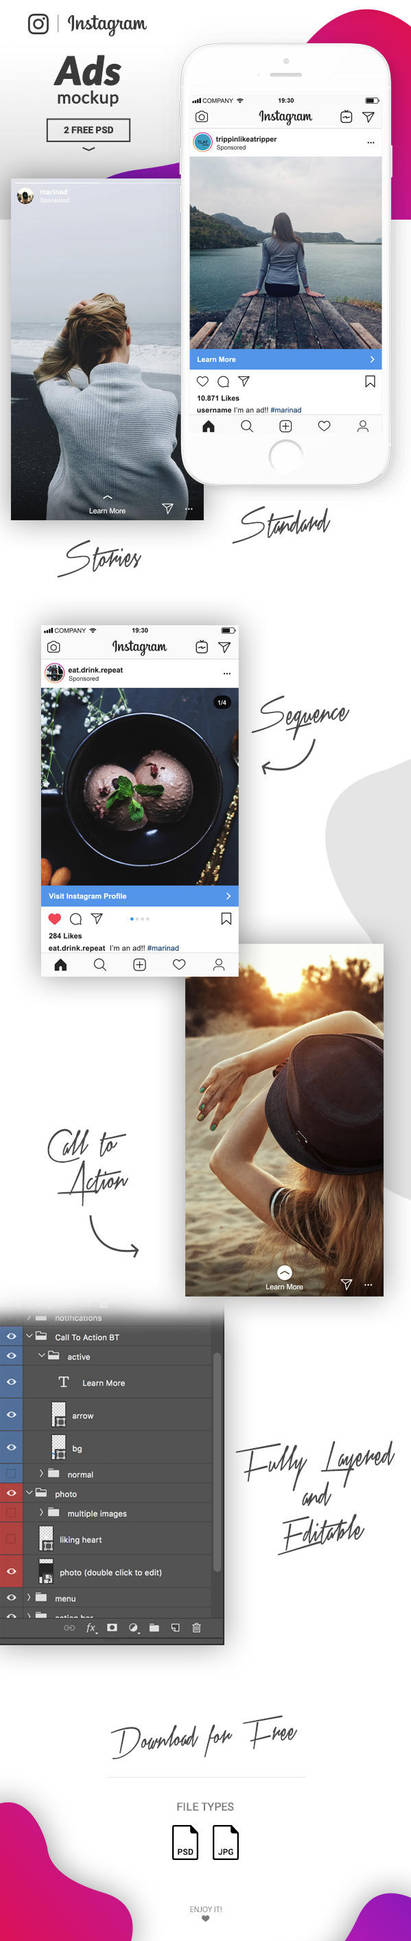 FREE Instagram Ads Mockup 2018 by MarinaD